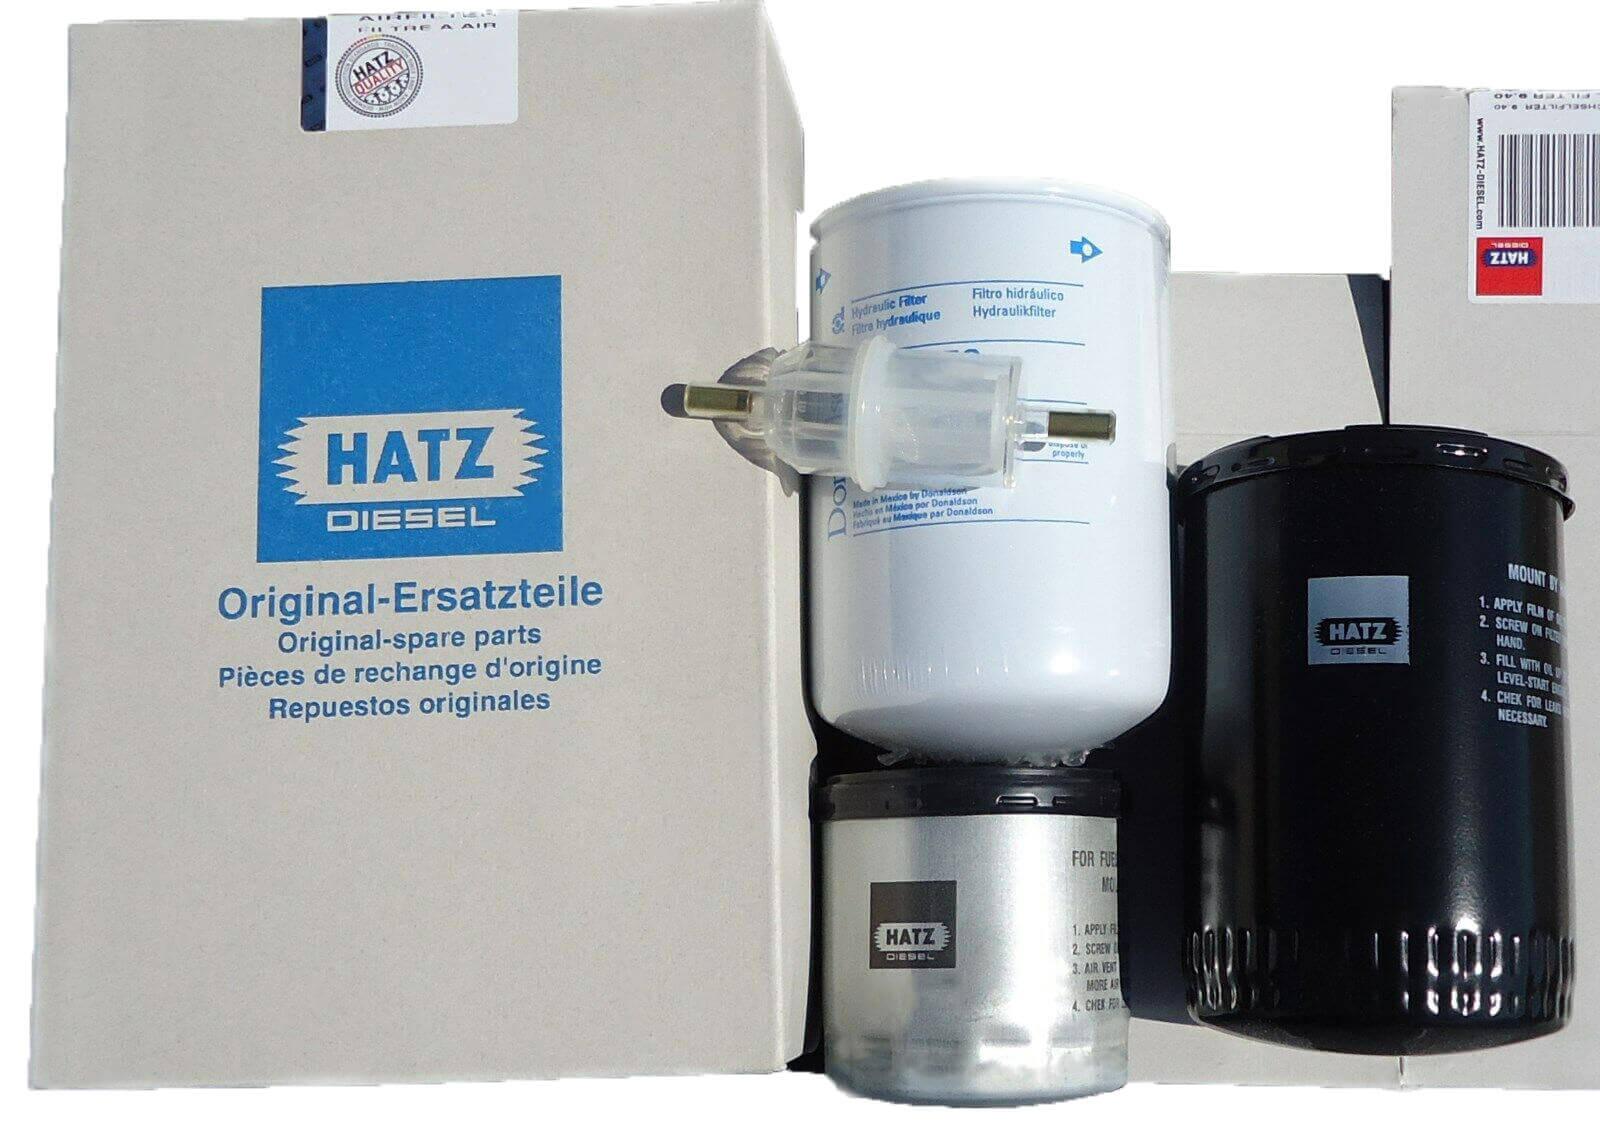 hydro jetter preventative maintenance - Hydro Jetter Service & Repair